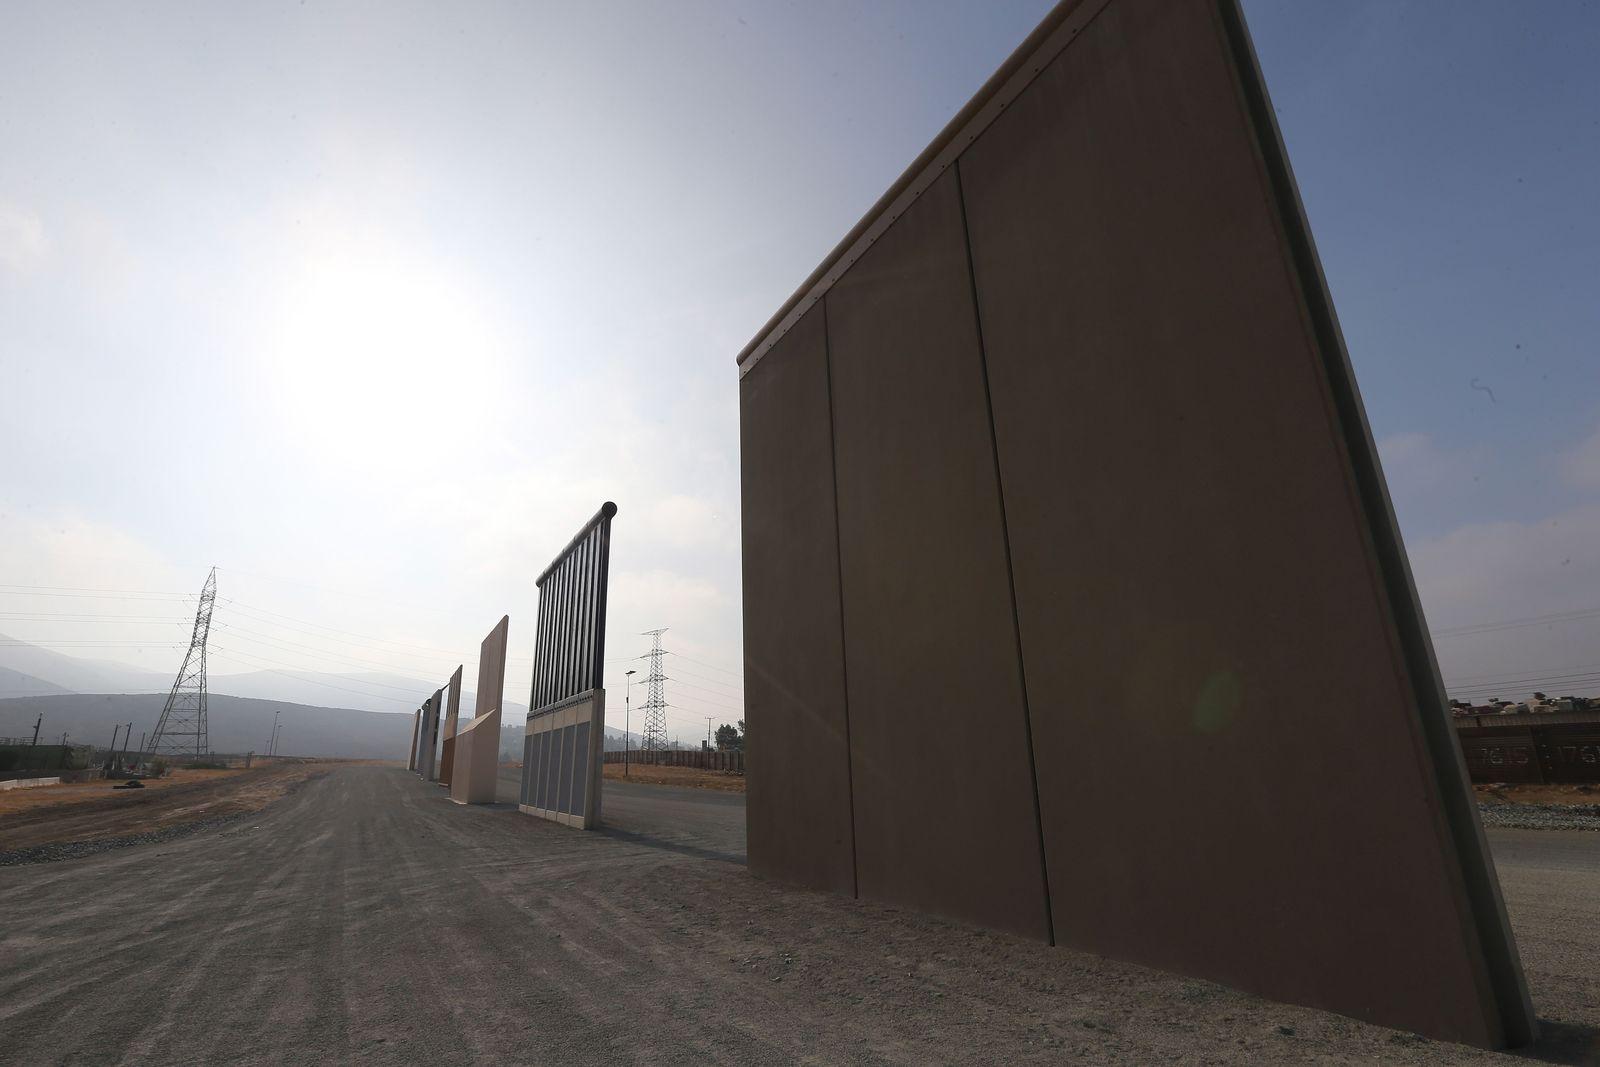 U.S. Border Patrol Monitors California-Mexico Border